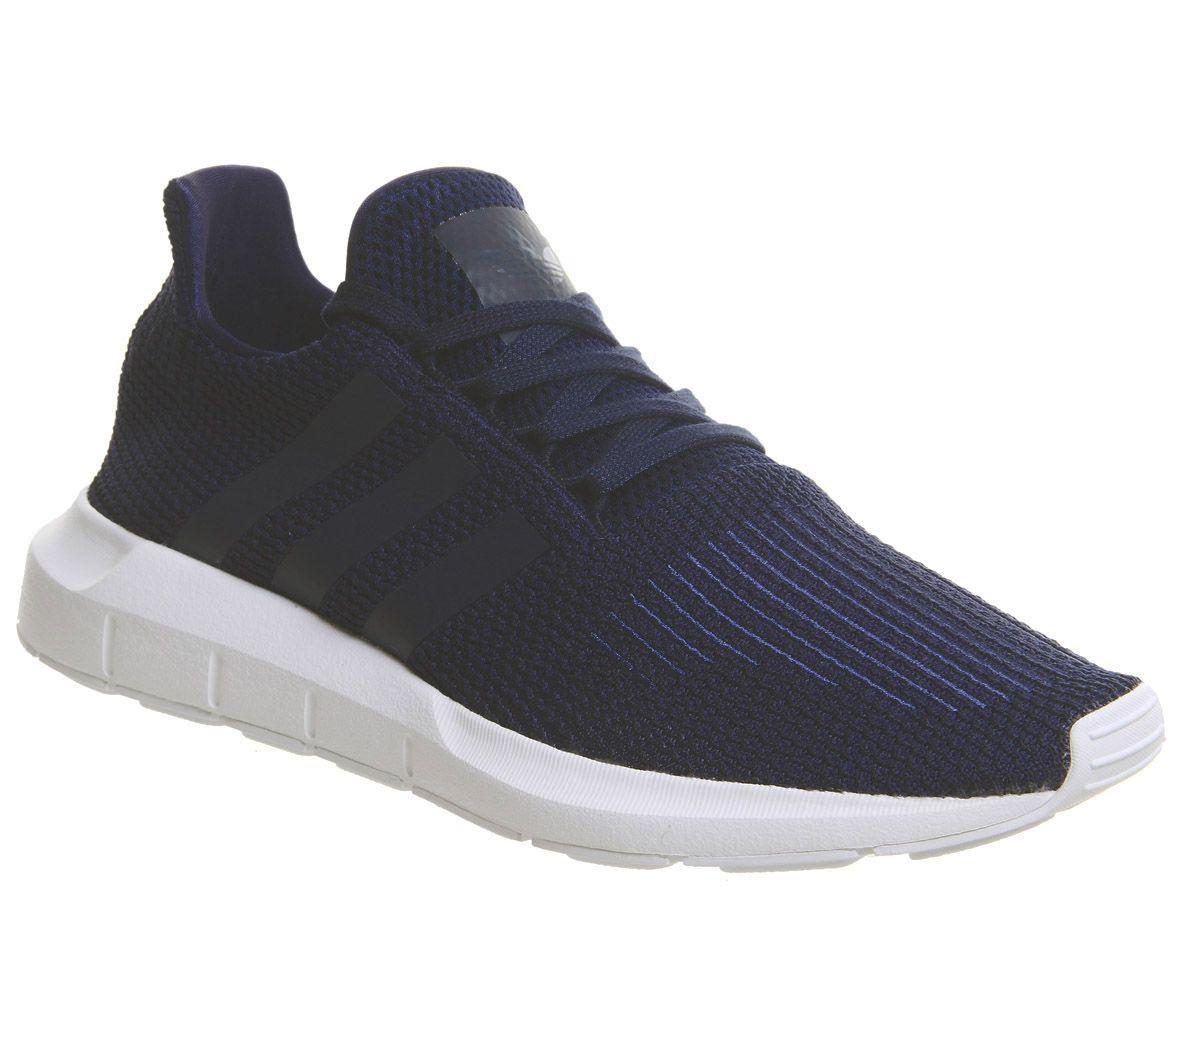 cc723d2c2 adidas Swift Run Trainers in Blue - Lyst